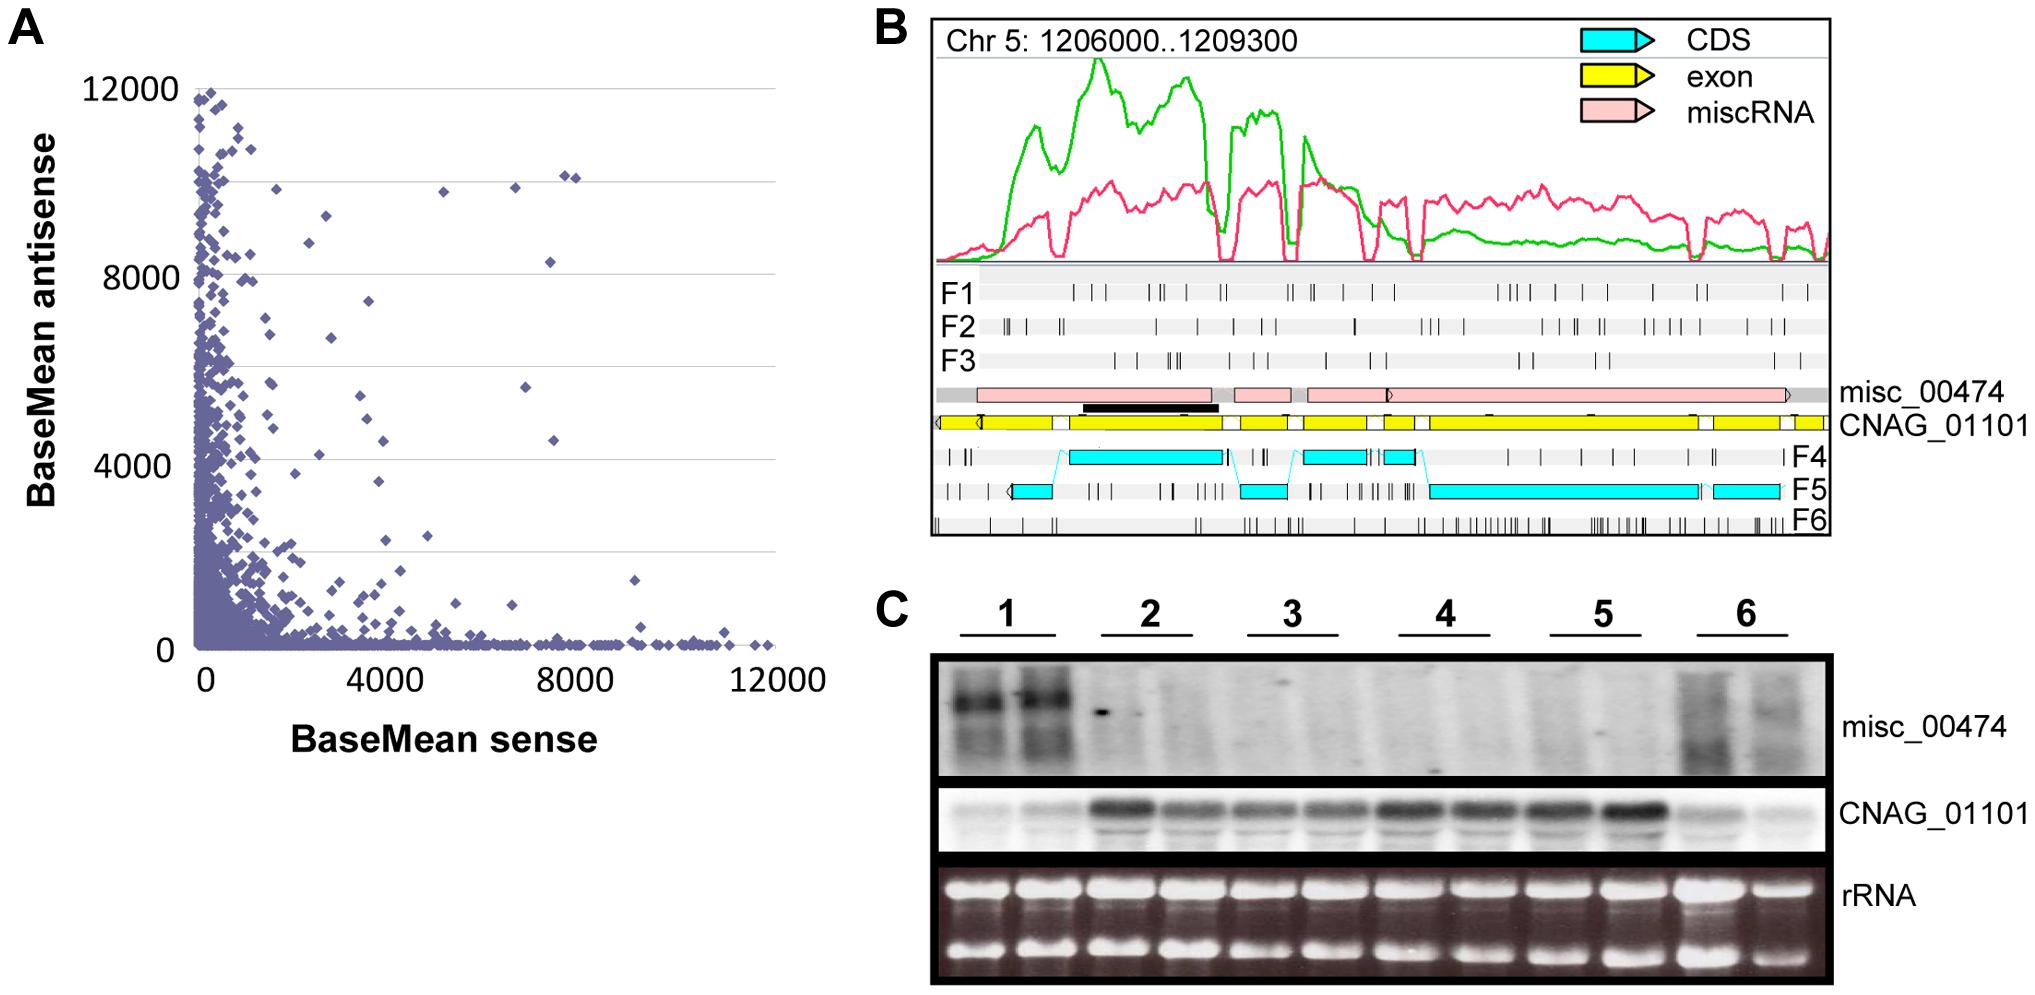 Antisense/sense transcription in <i>C. neoformans</i> var. <i>grubii</i>.